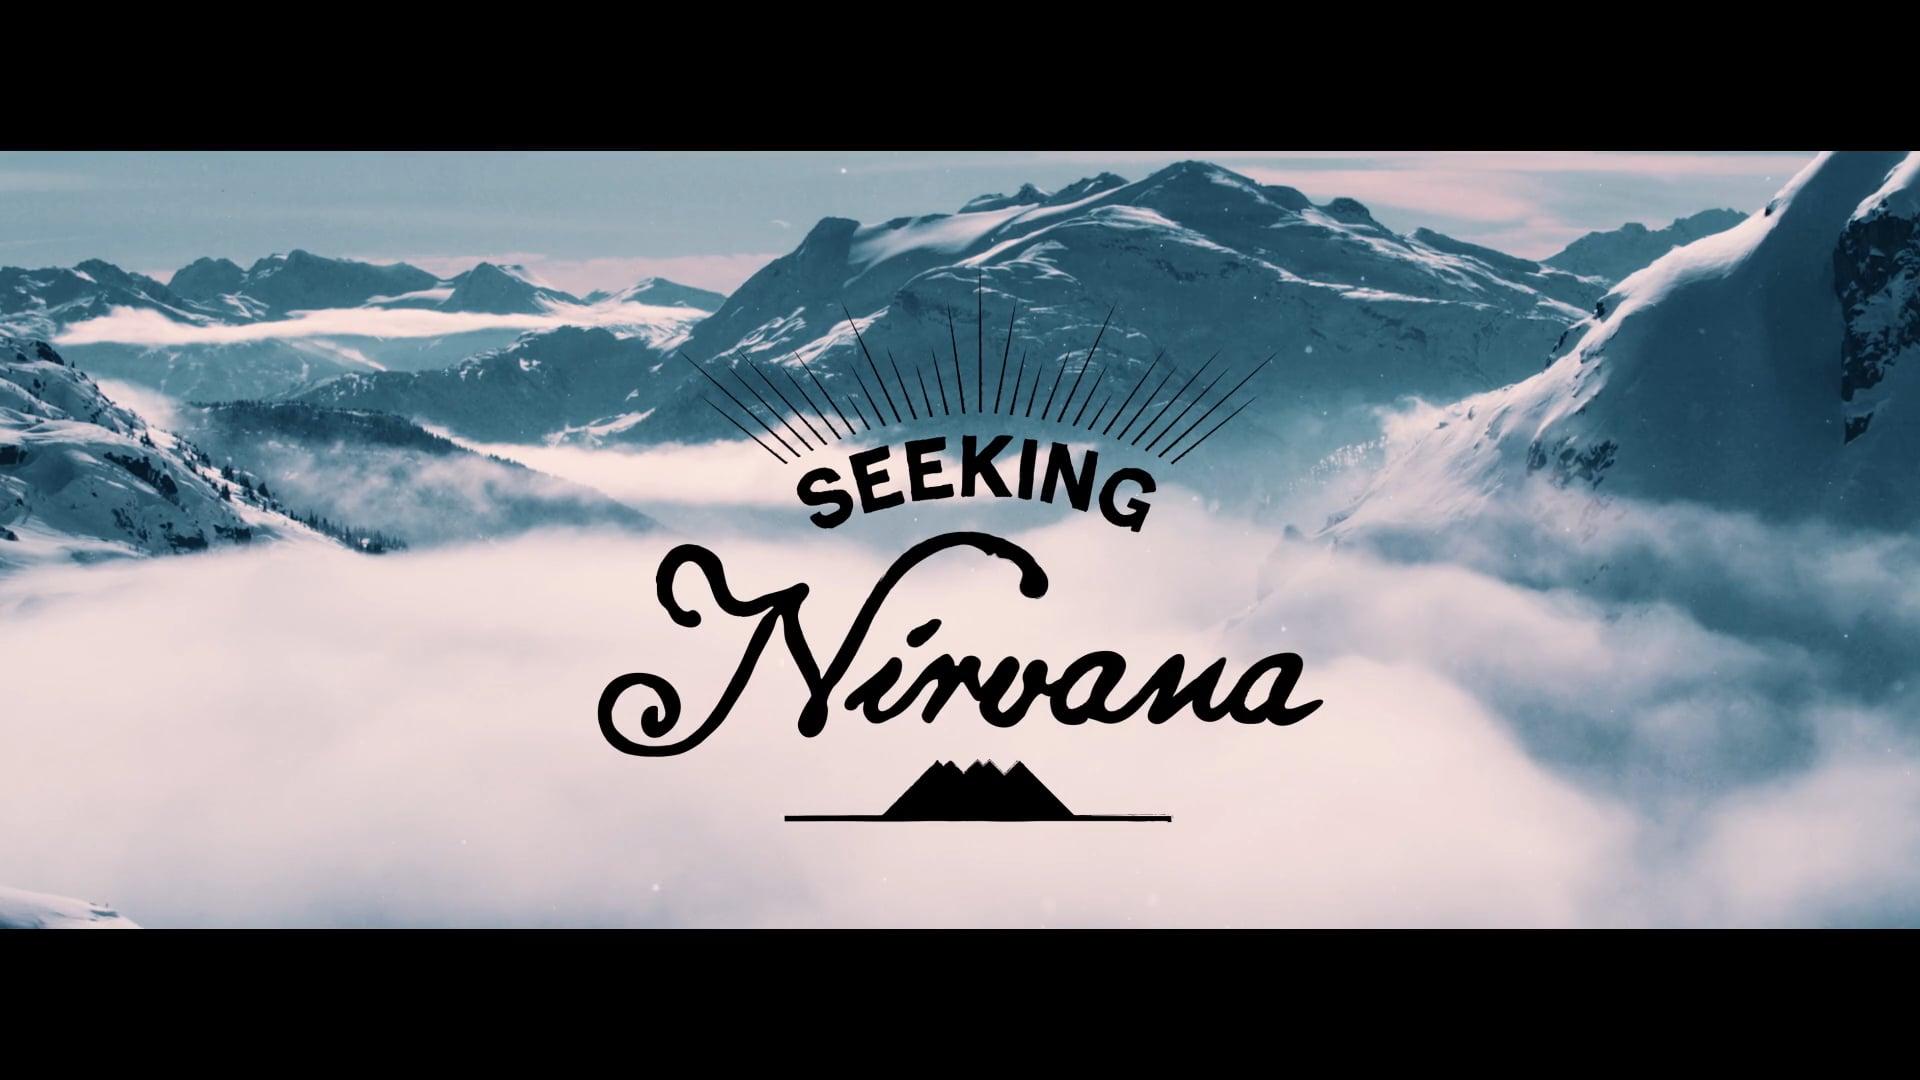 Seeking Nirvana – Alle Videos der dritten Staffel (18/19) – Ep. 3.3 online